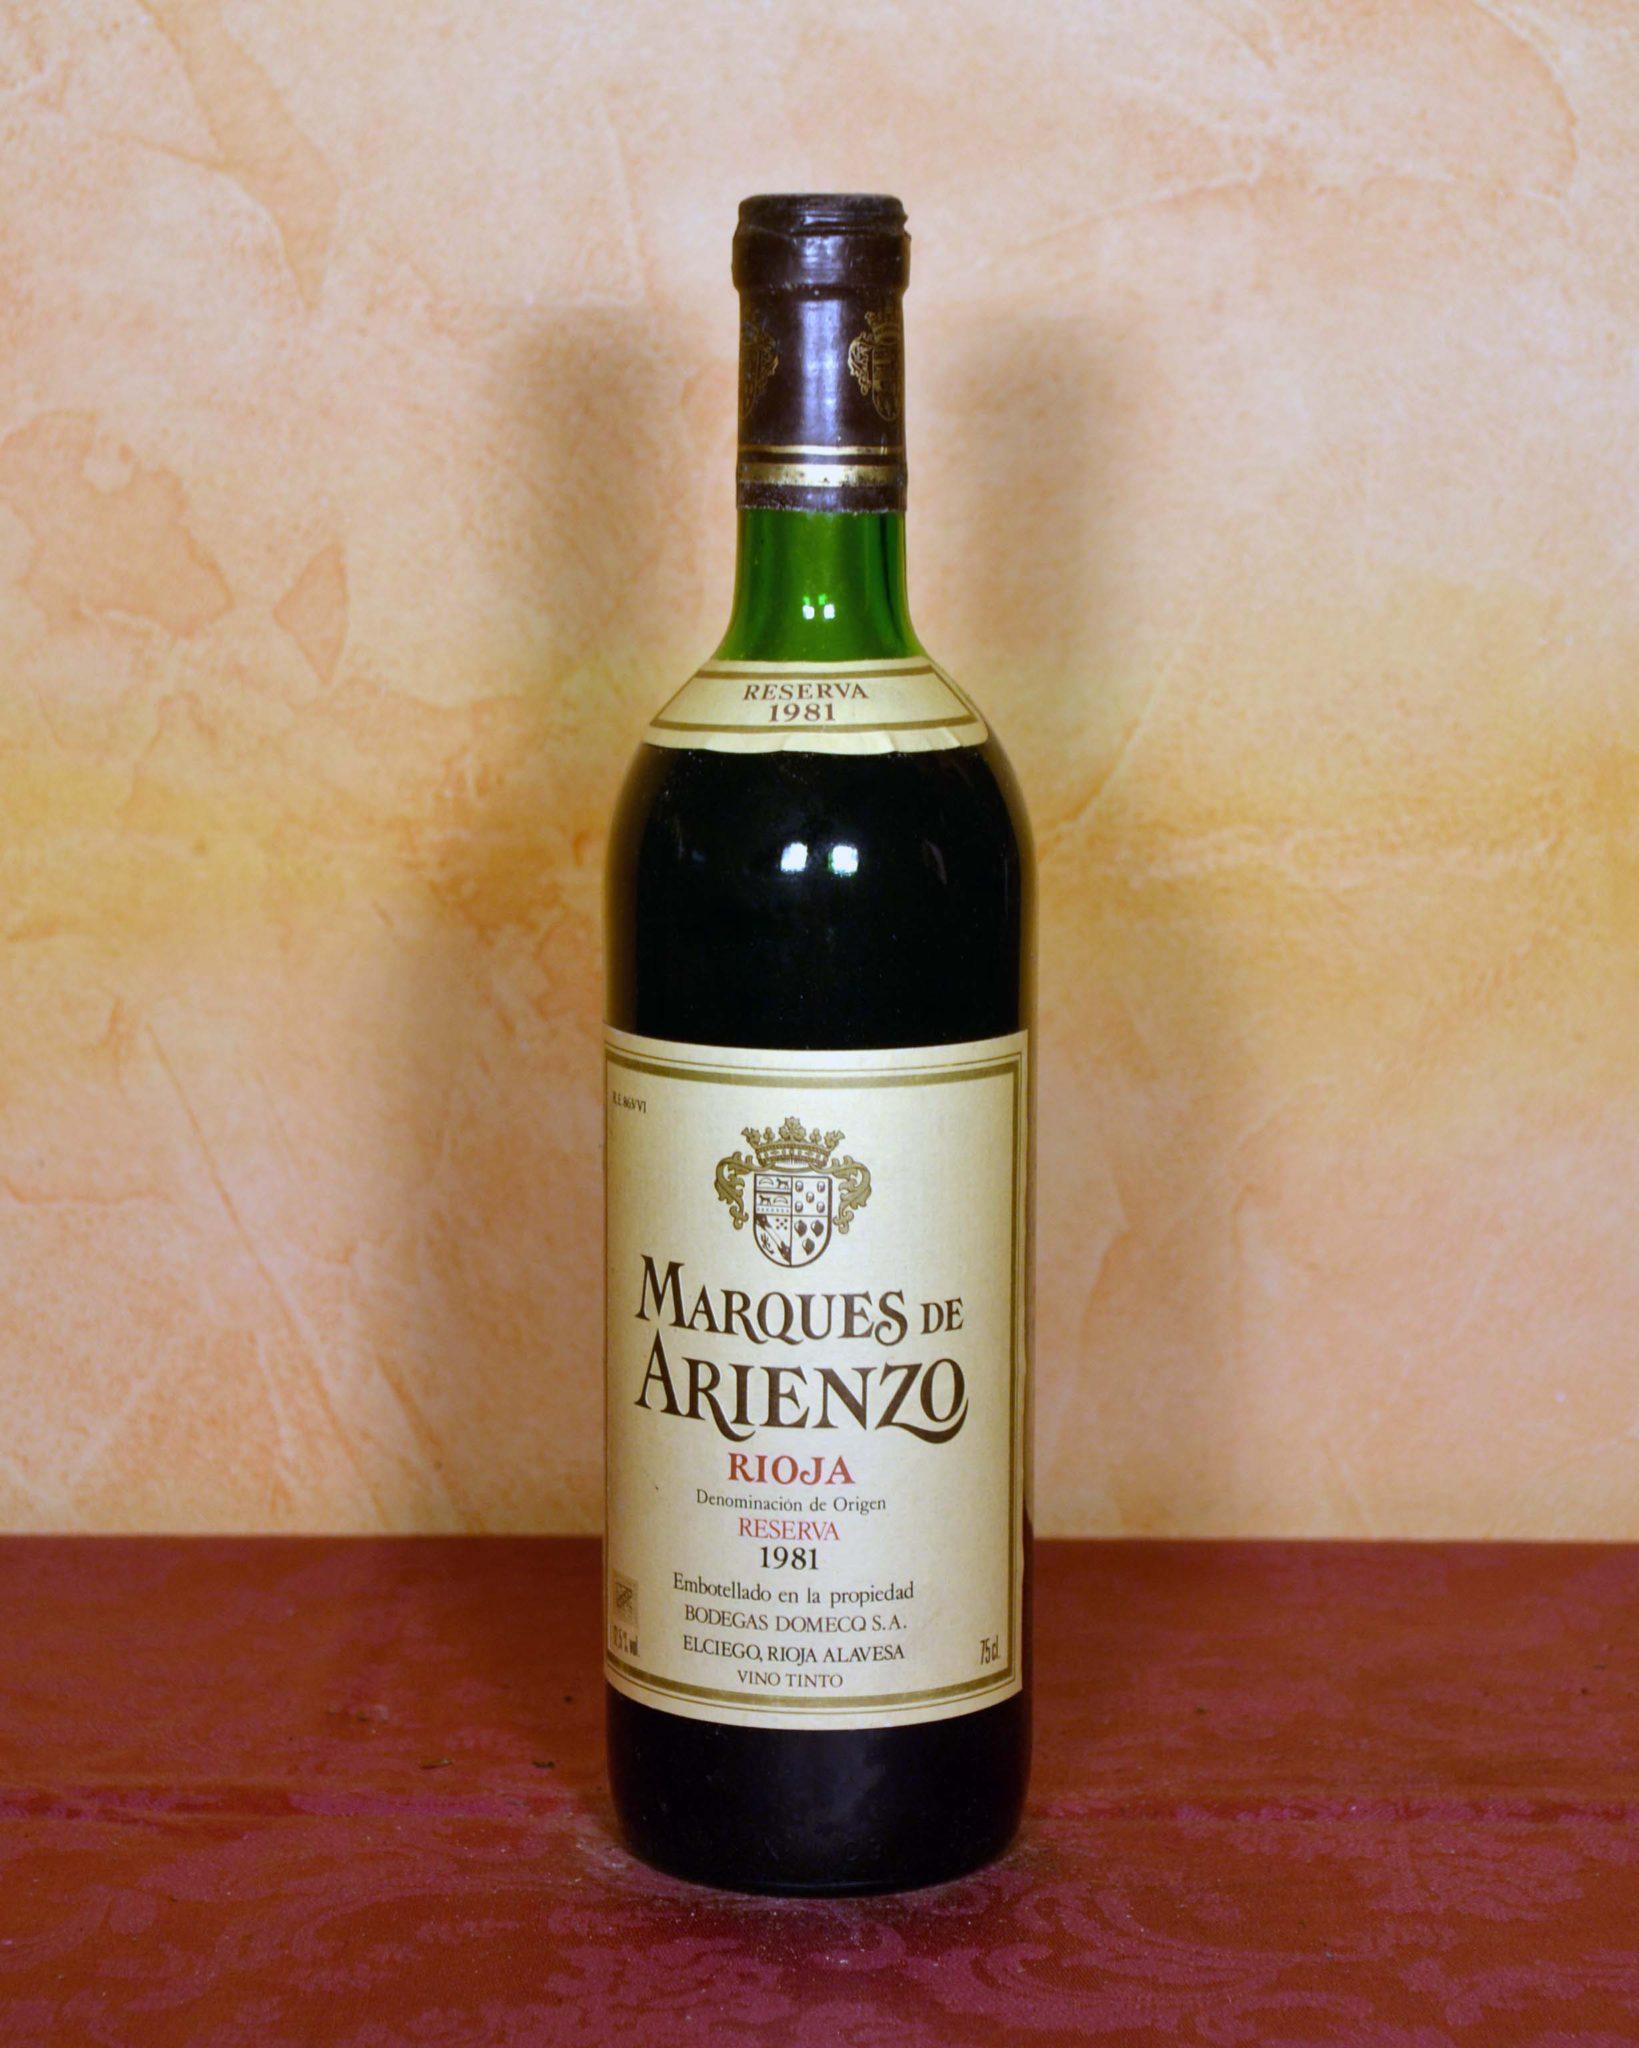 Marques de Arienzo Reserve 1981